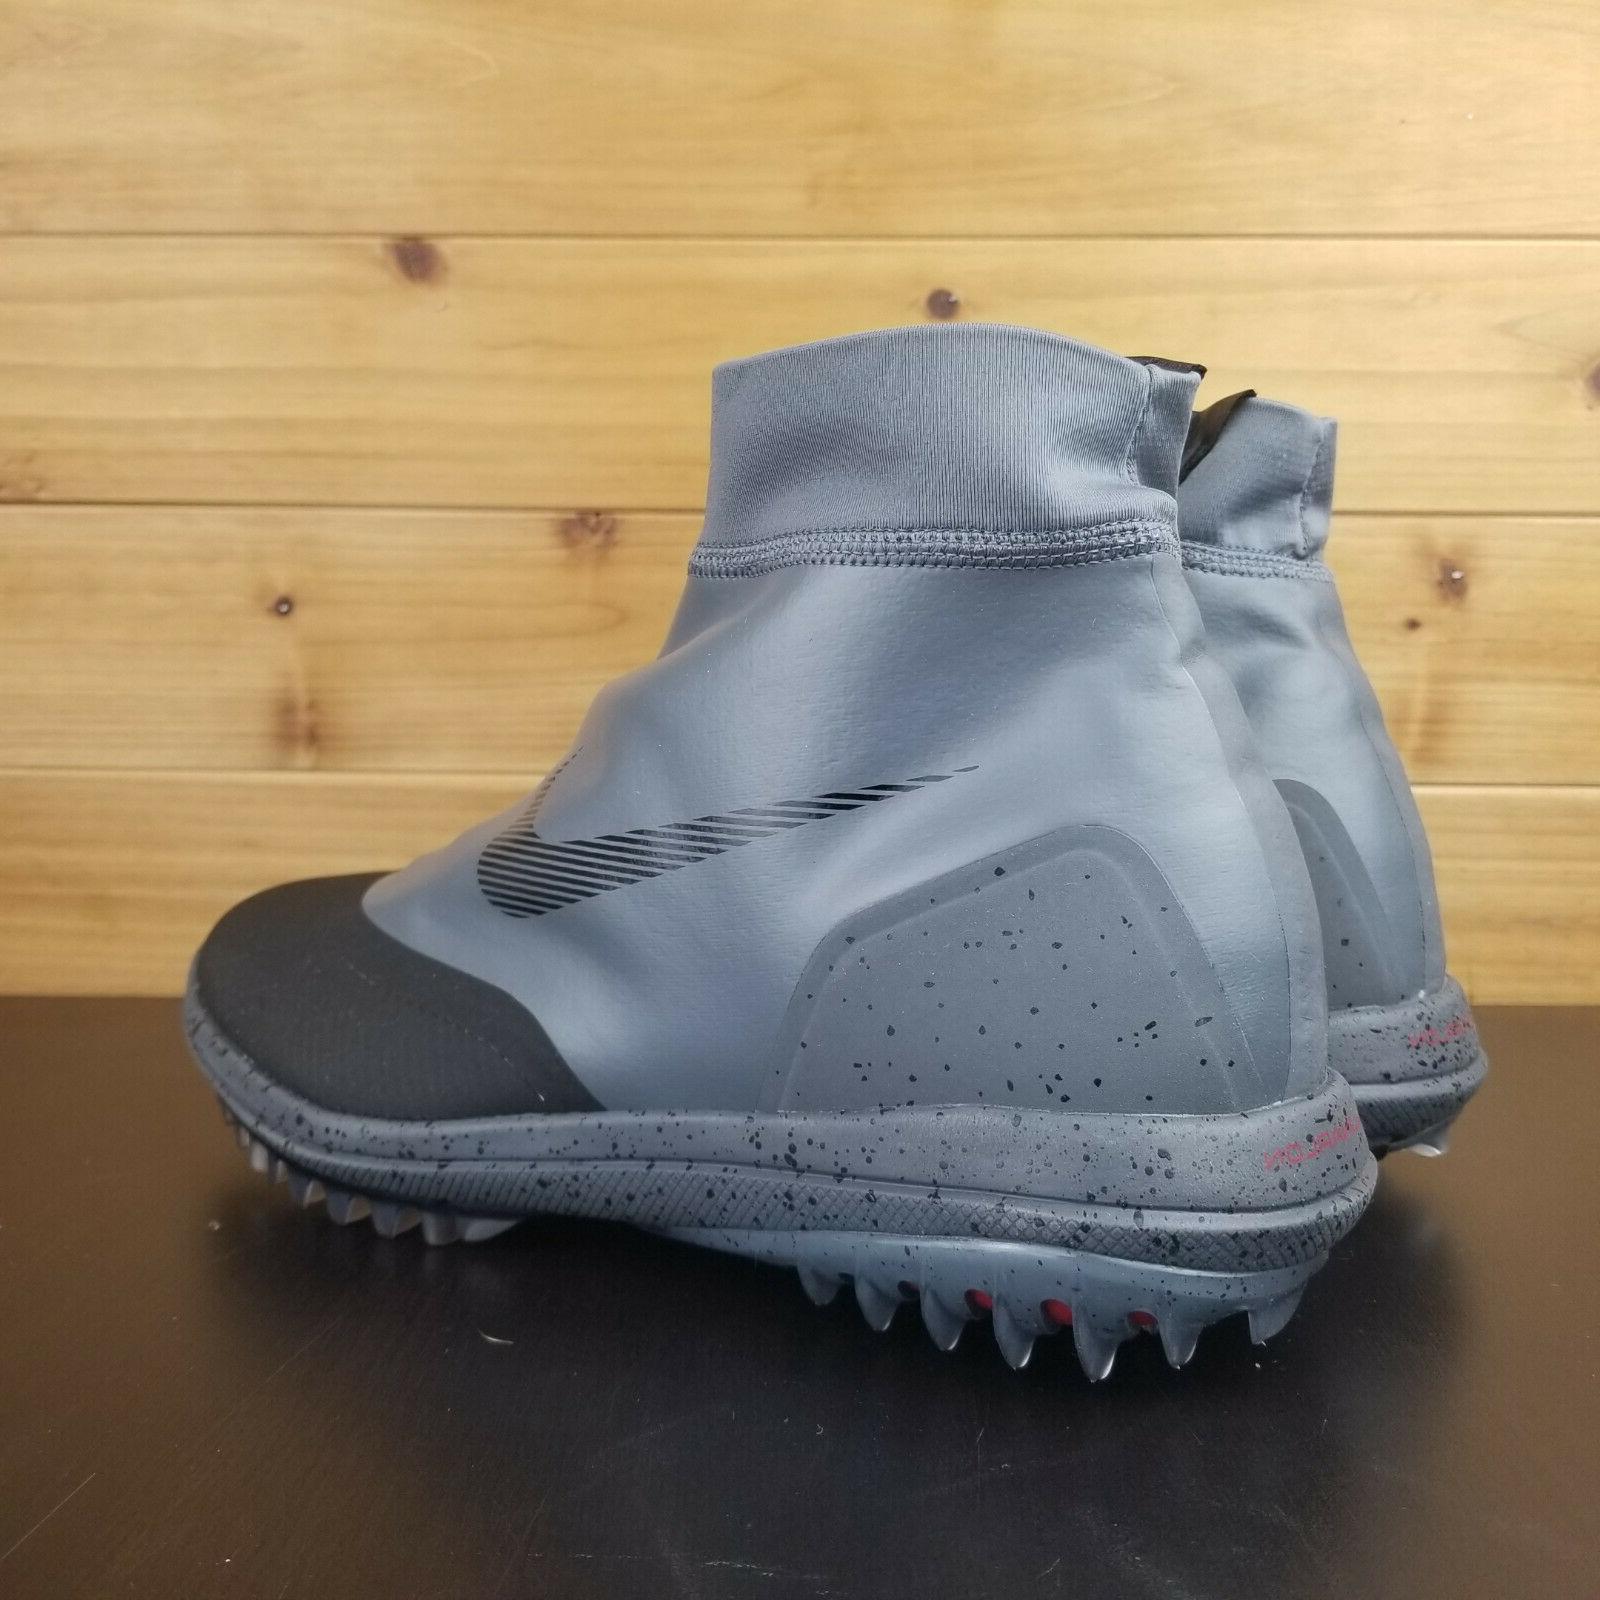 Nike Vaporstorm Shoes Black 918623-003 Men's Wide Waterproof